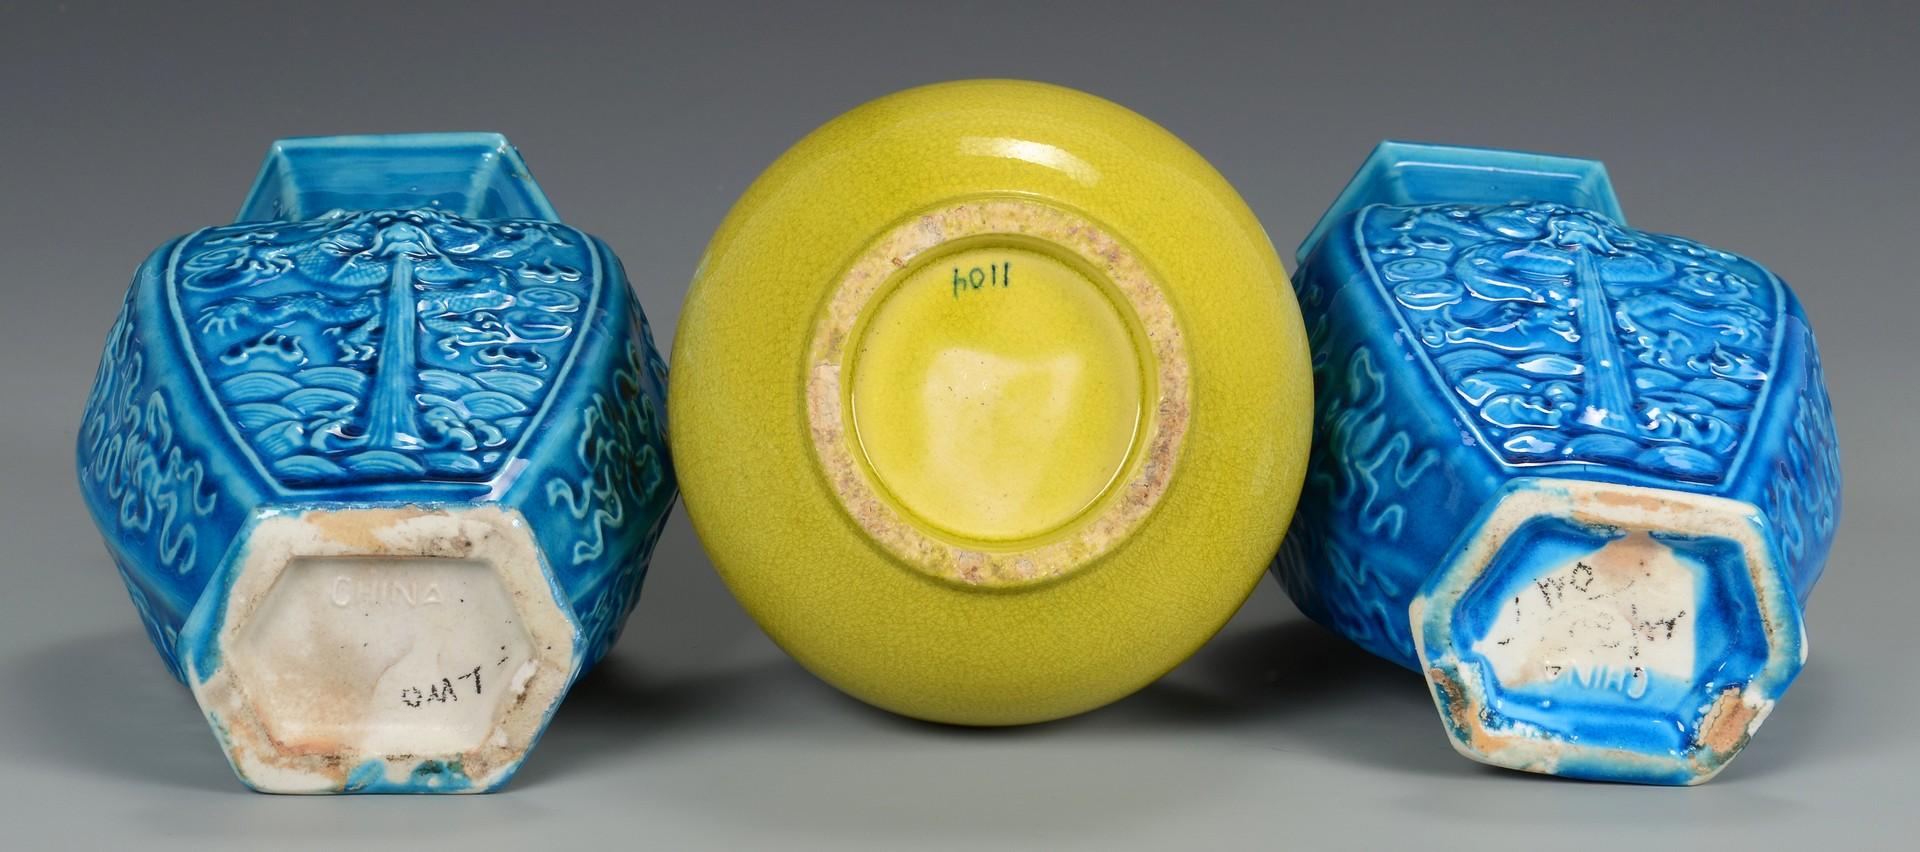 Lot 3594224: 3 Chinese Monochrome Glaze Vases